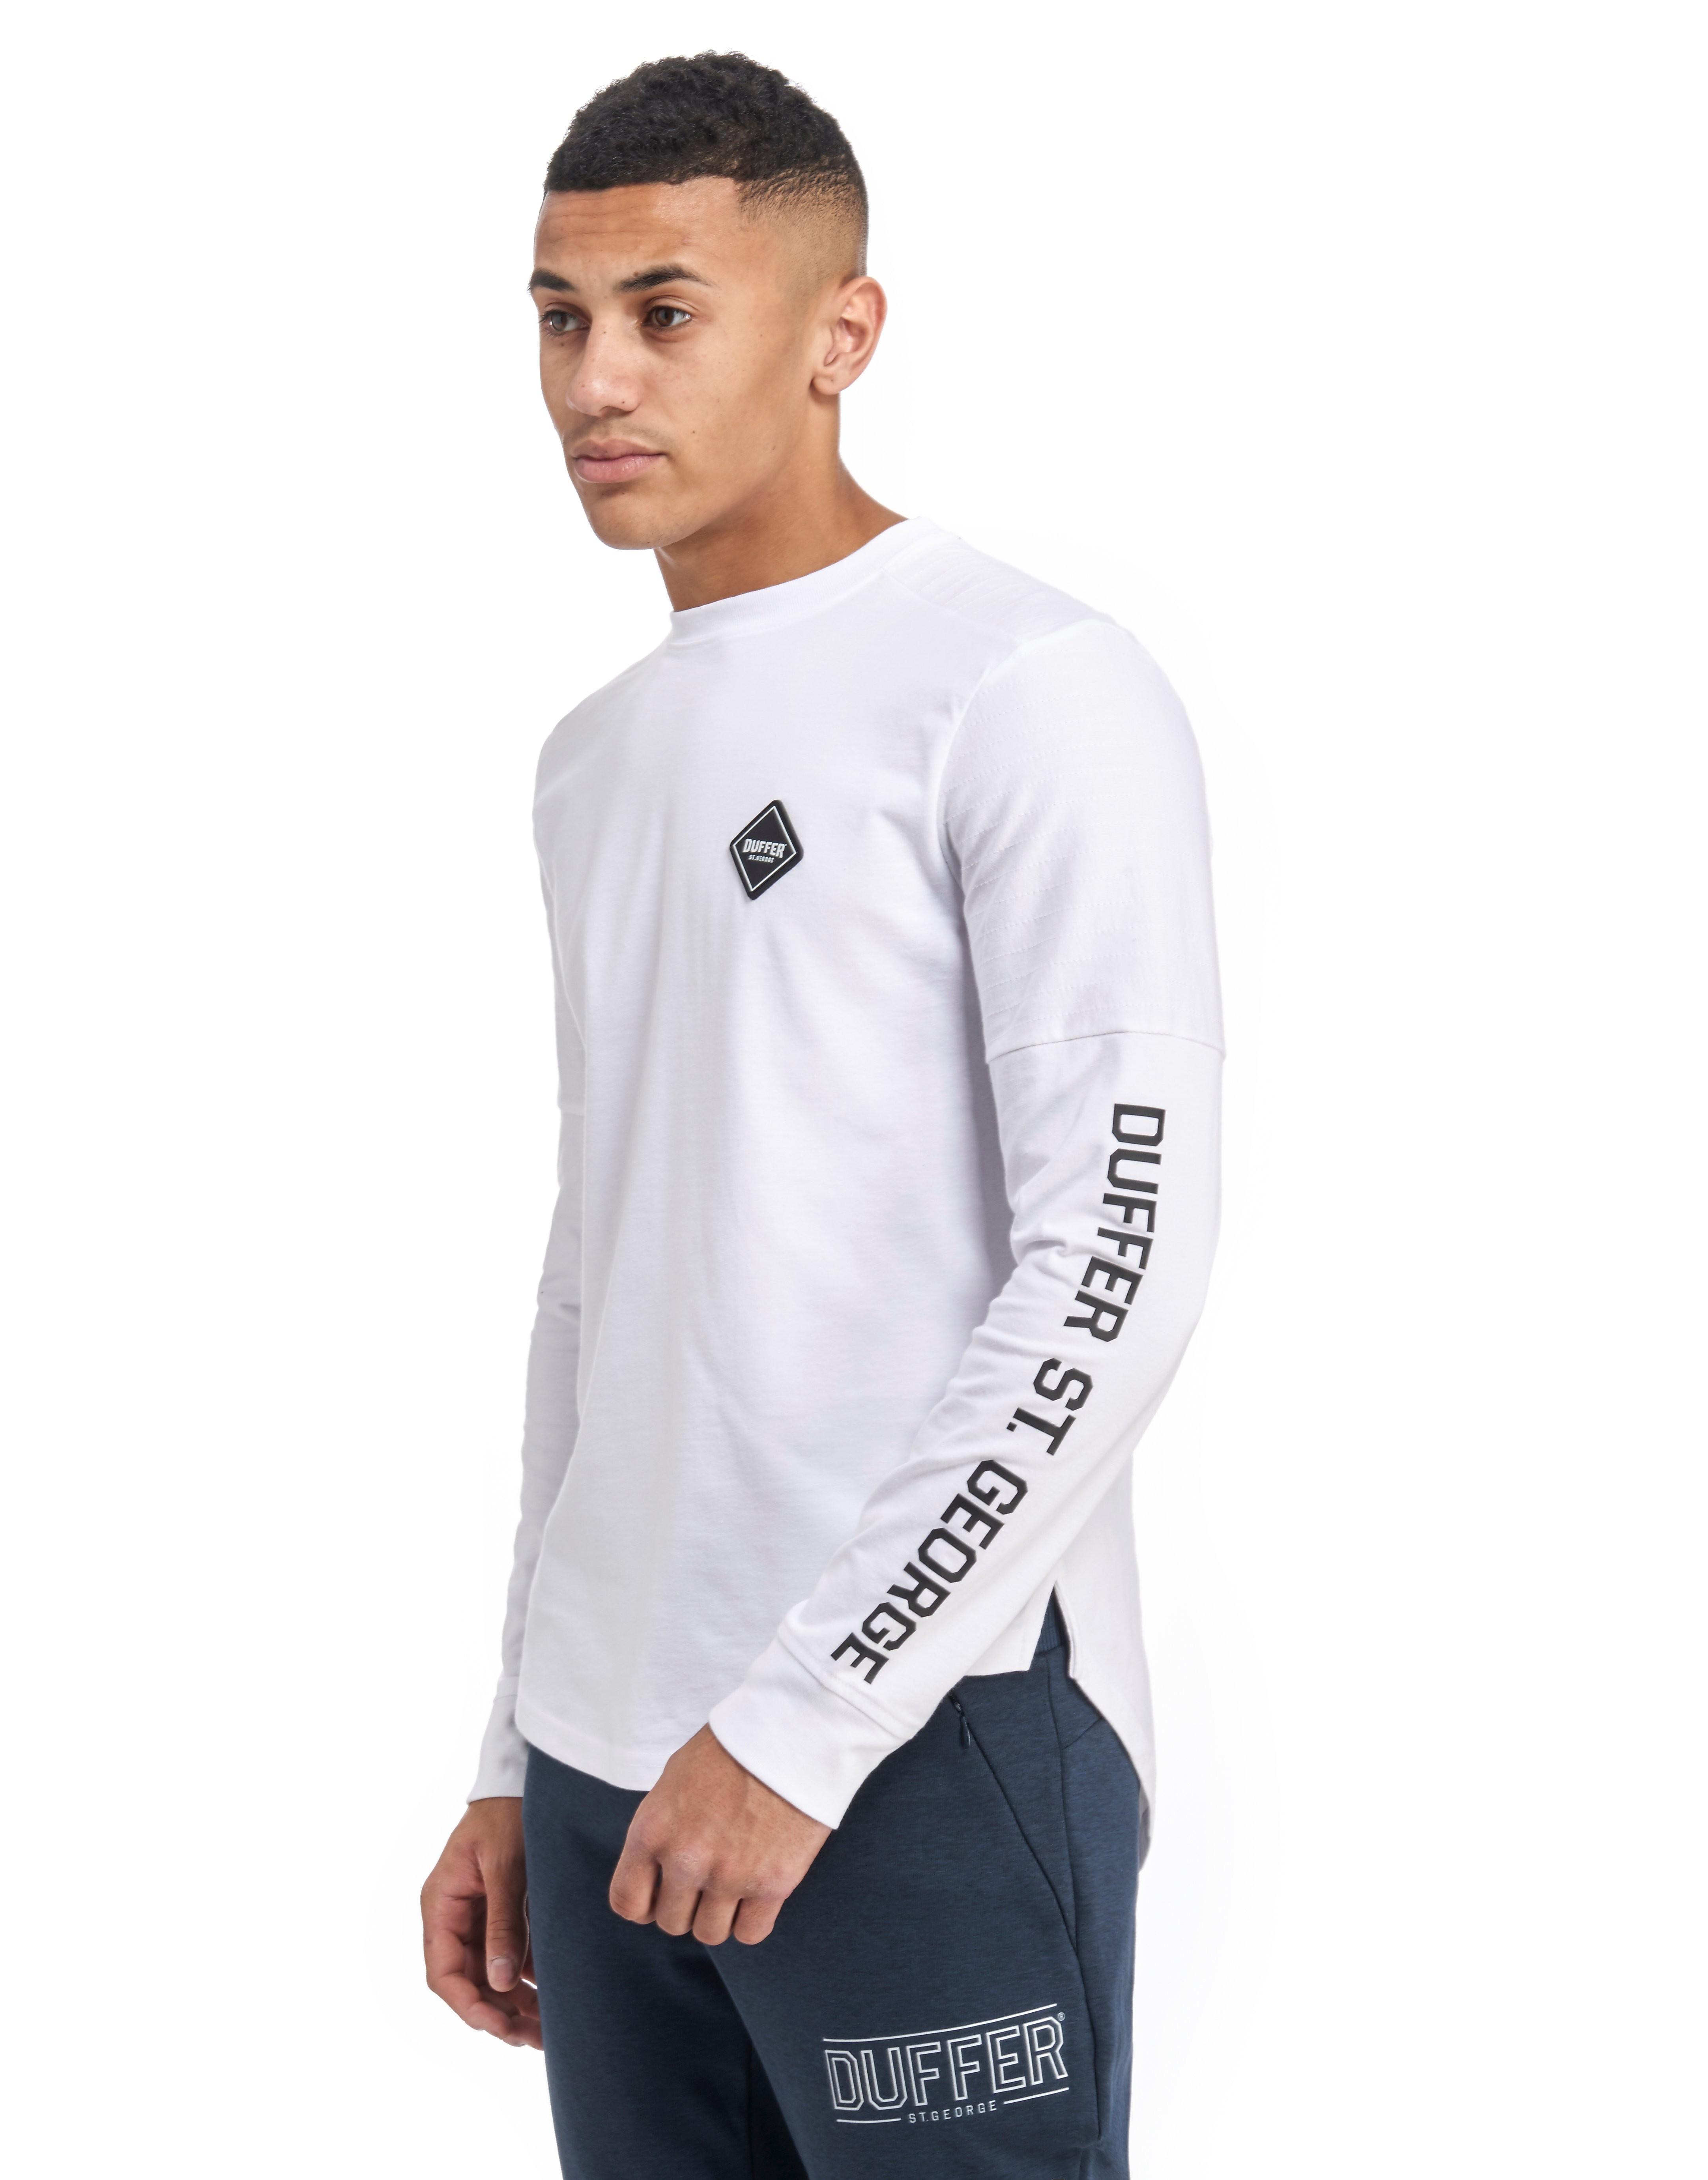 Duffer of St George Black Label Quest Longsleeve T-Shirt